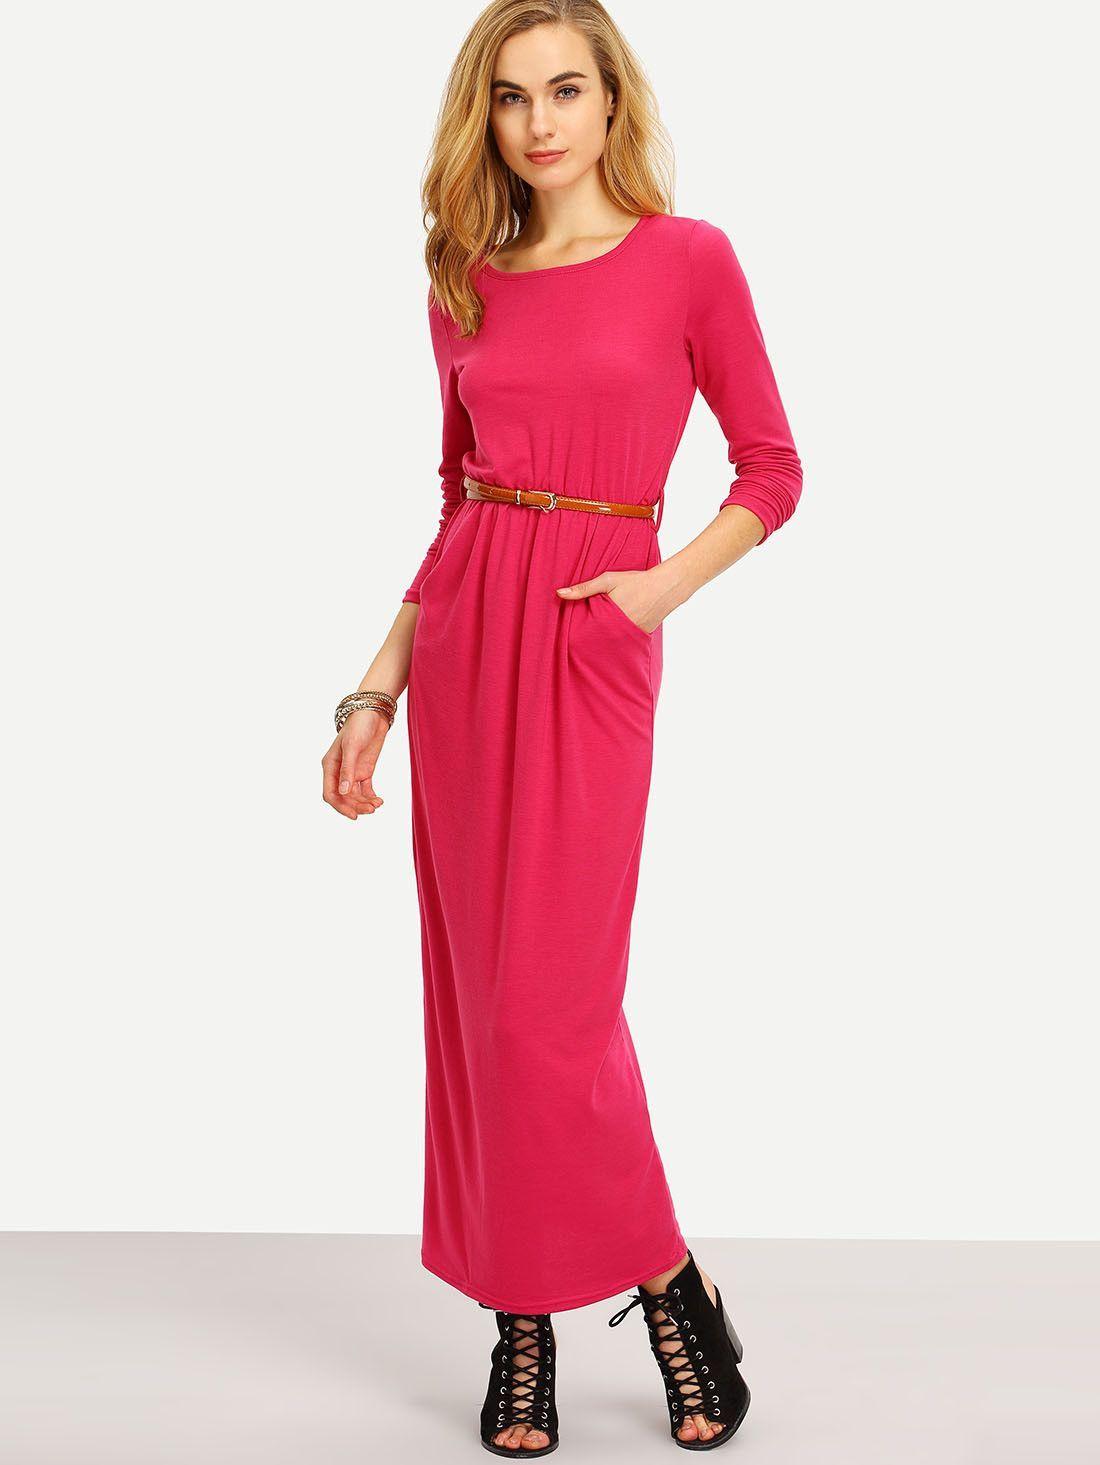 Hot pink long sleeve pockets maxi dress hot pink maxi dresses and